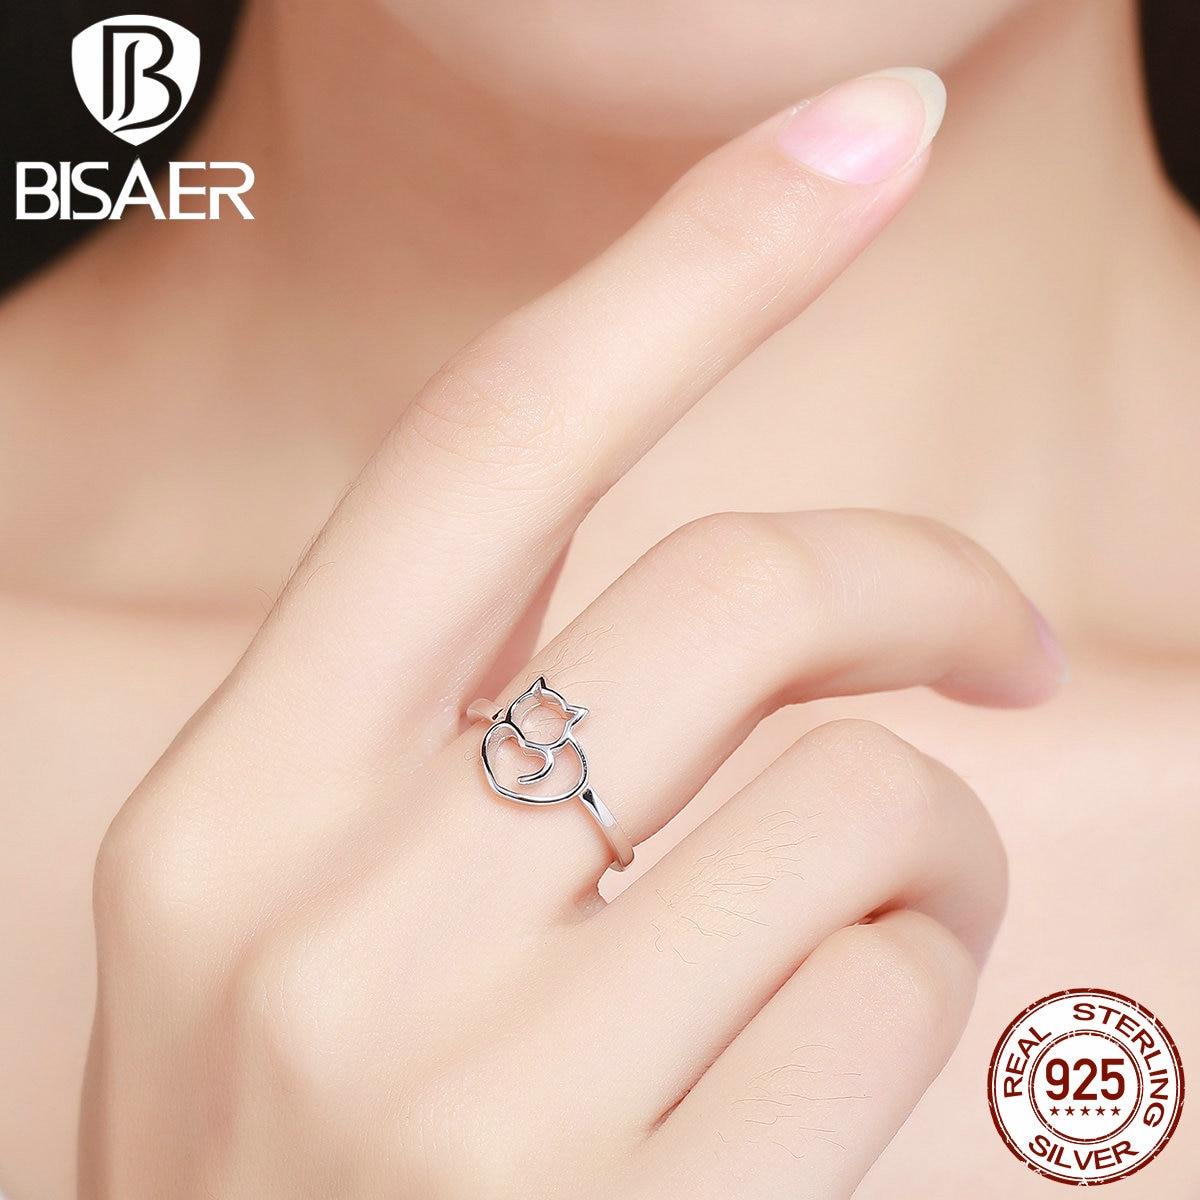 fotos oficiales c90e4 72295 € 4.53 30% de DESCUENTO|Anillos lindos de Plata de Ley 925 BISAER Adorable  forma de corazón de gato anillos de dedo para mujeres anillo geométrico ...